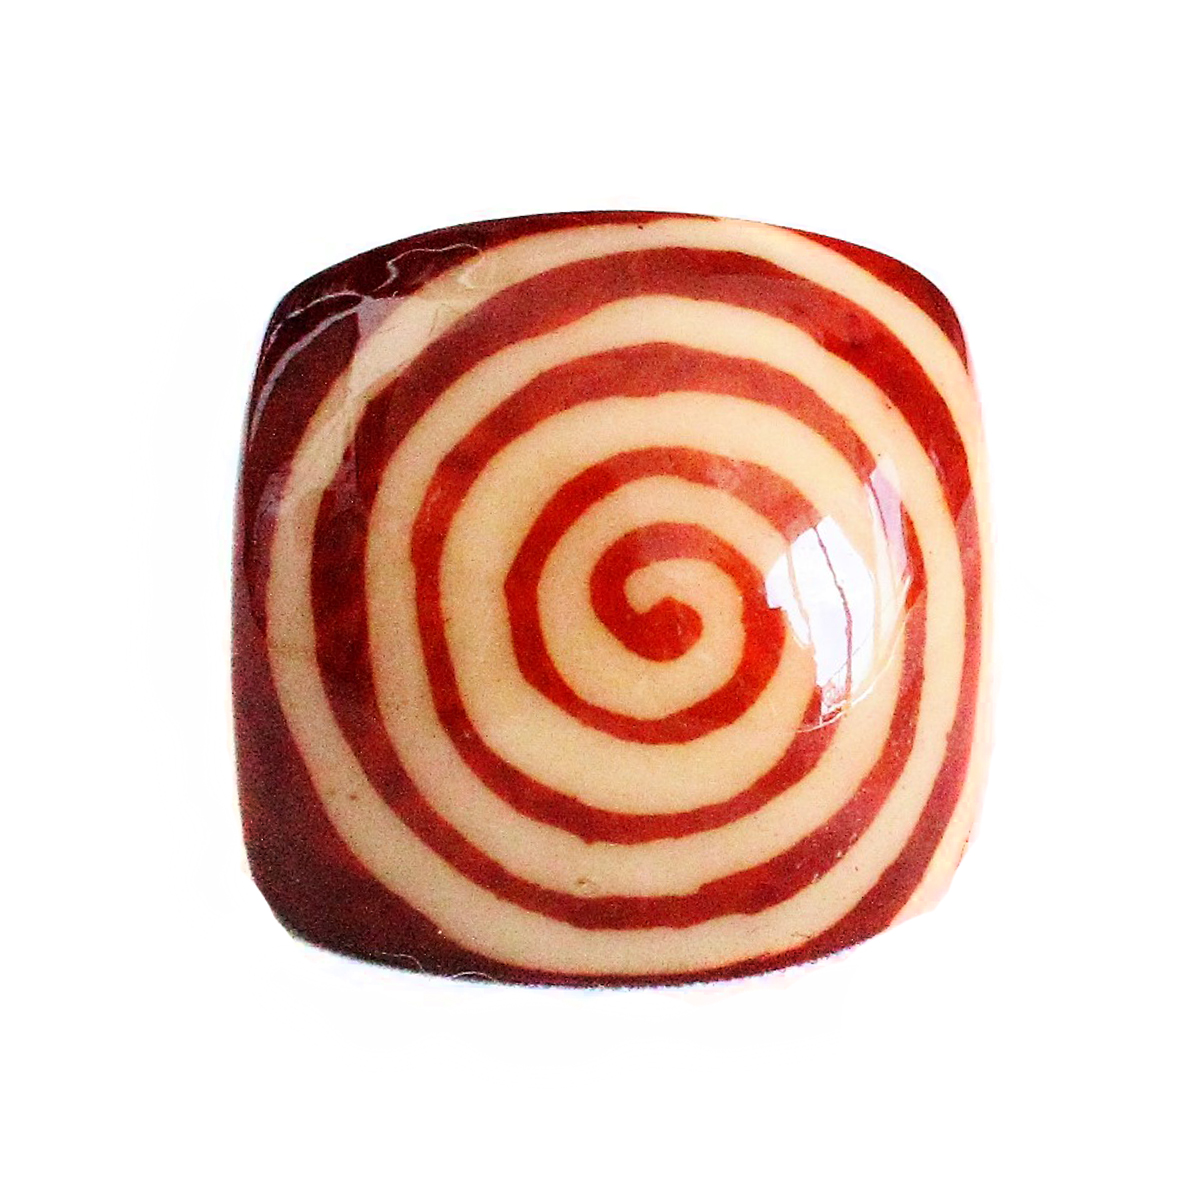 Inka-Products-Bague Tagua Batik-Spirale Carré Marron